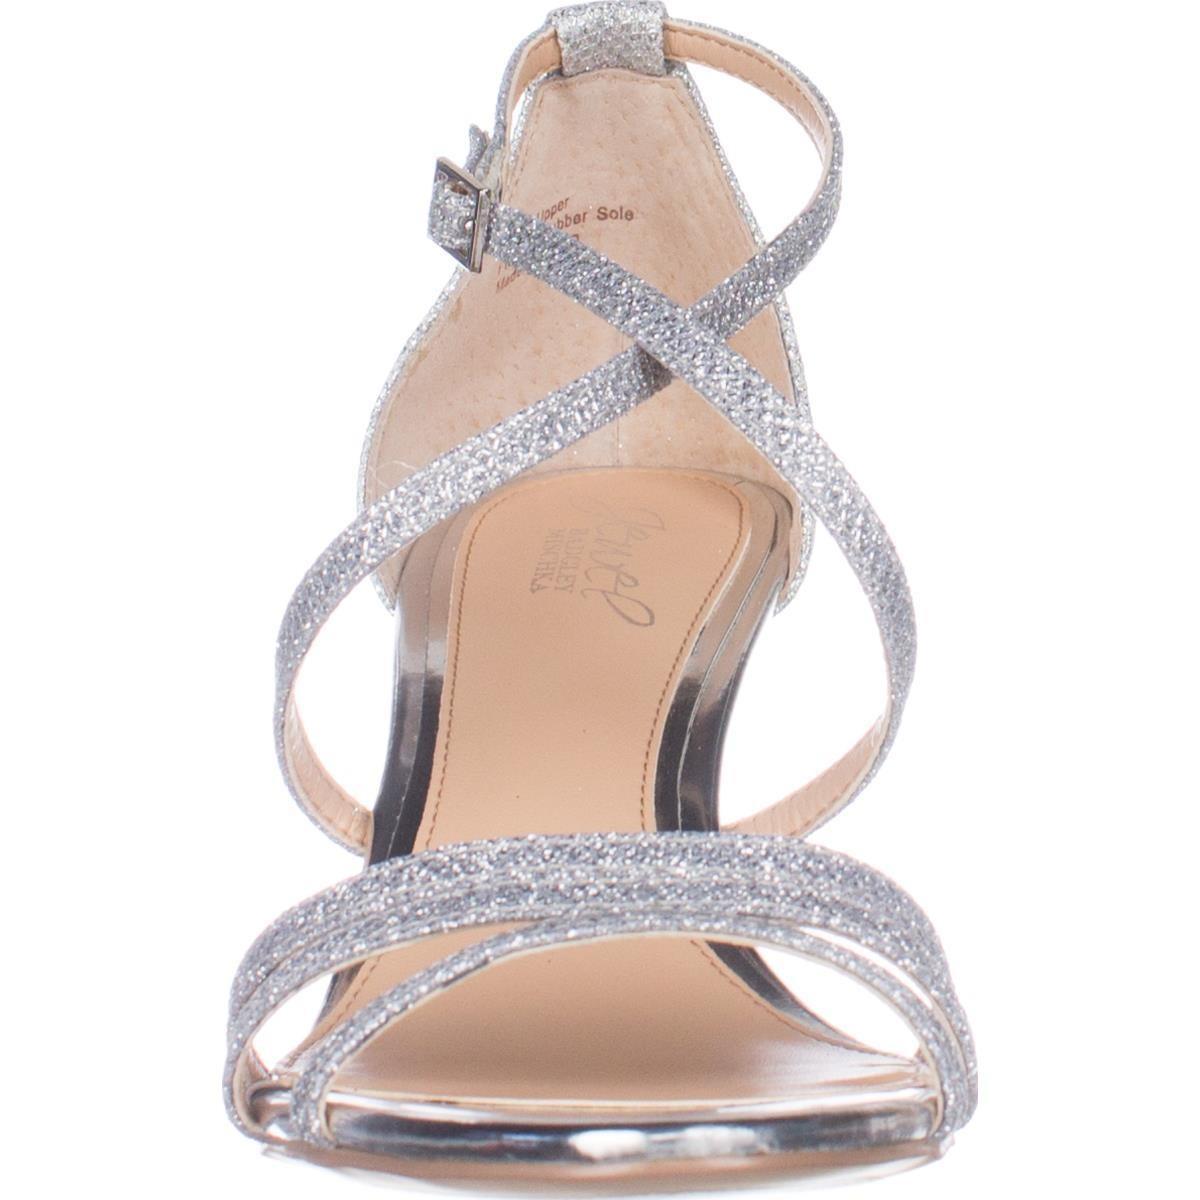 Badgley mischka Jewel Hunt Strappy Wedge Sandals in ...